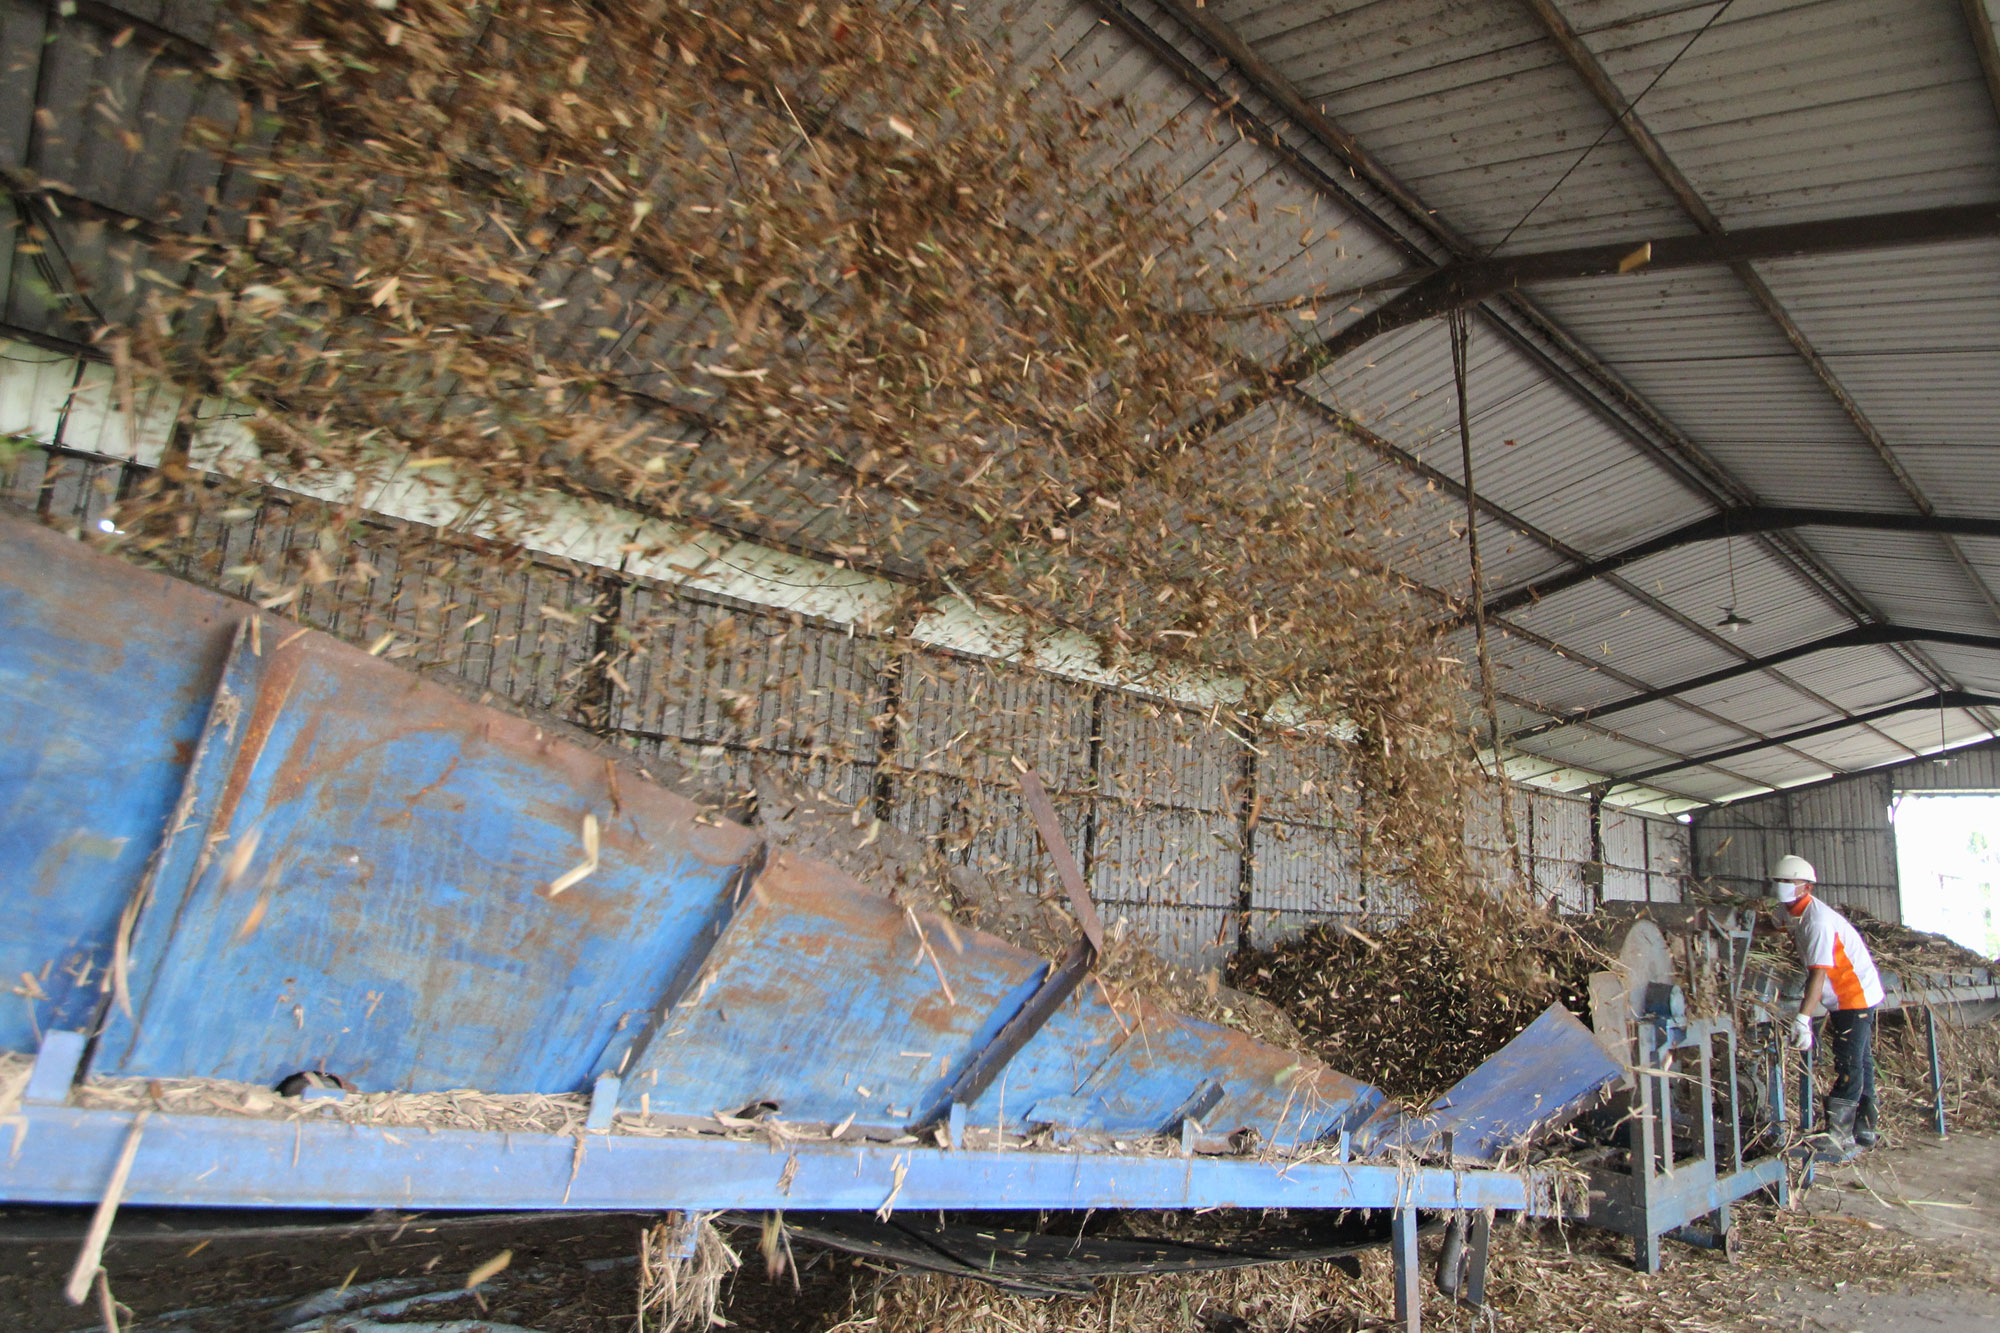 sugarcanetop---saraswanti---picture01